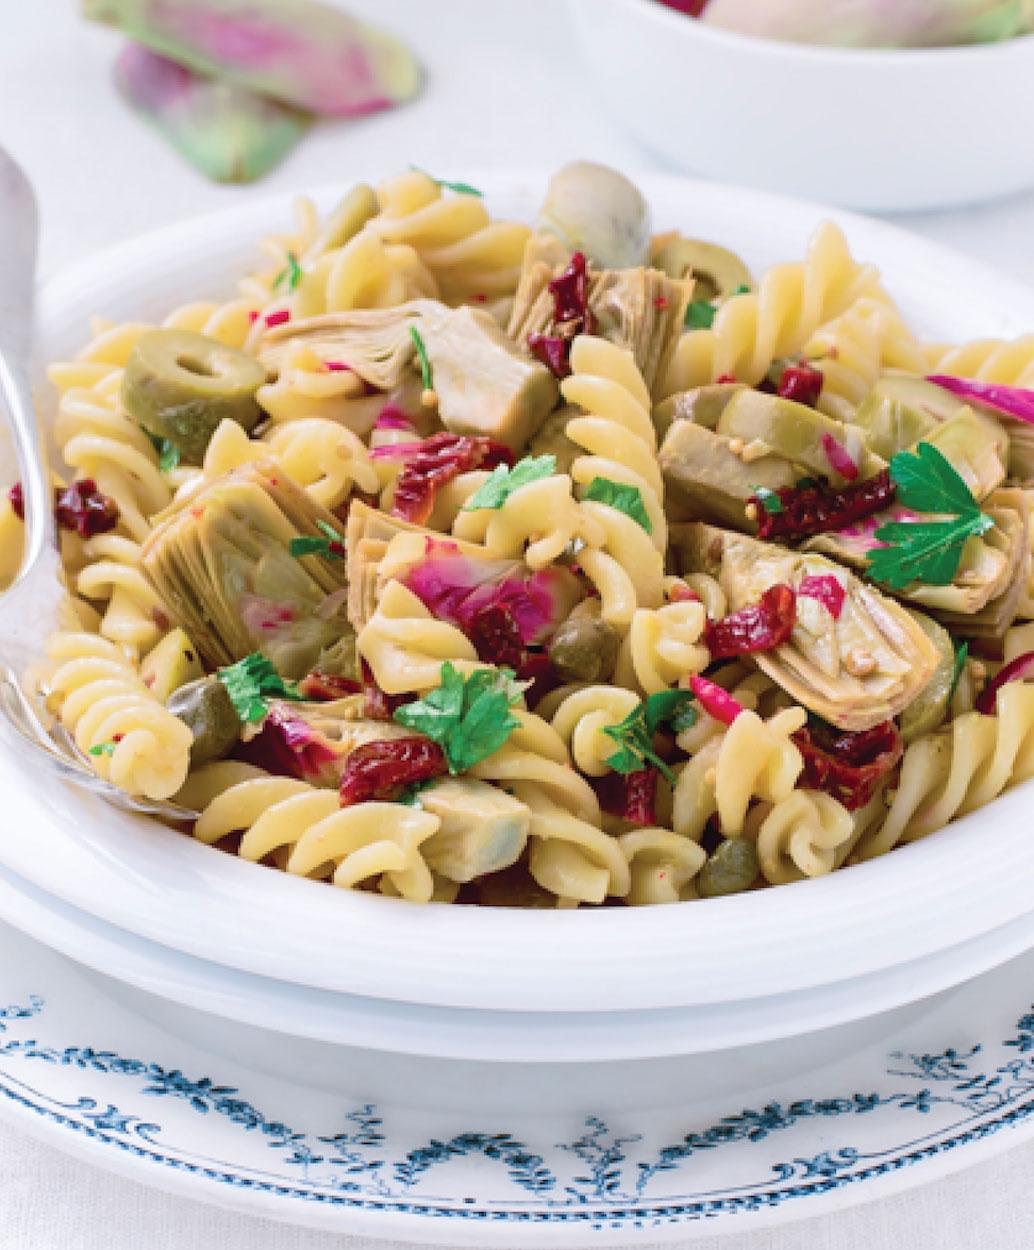 Mushroom and Artichoke Pasta